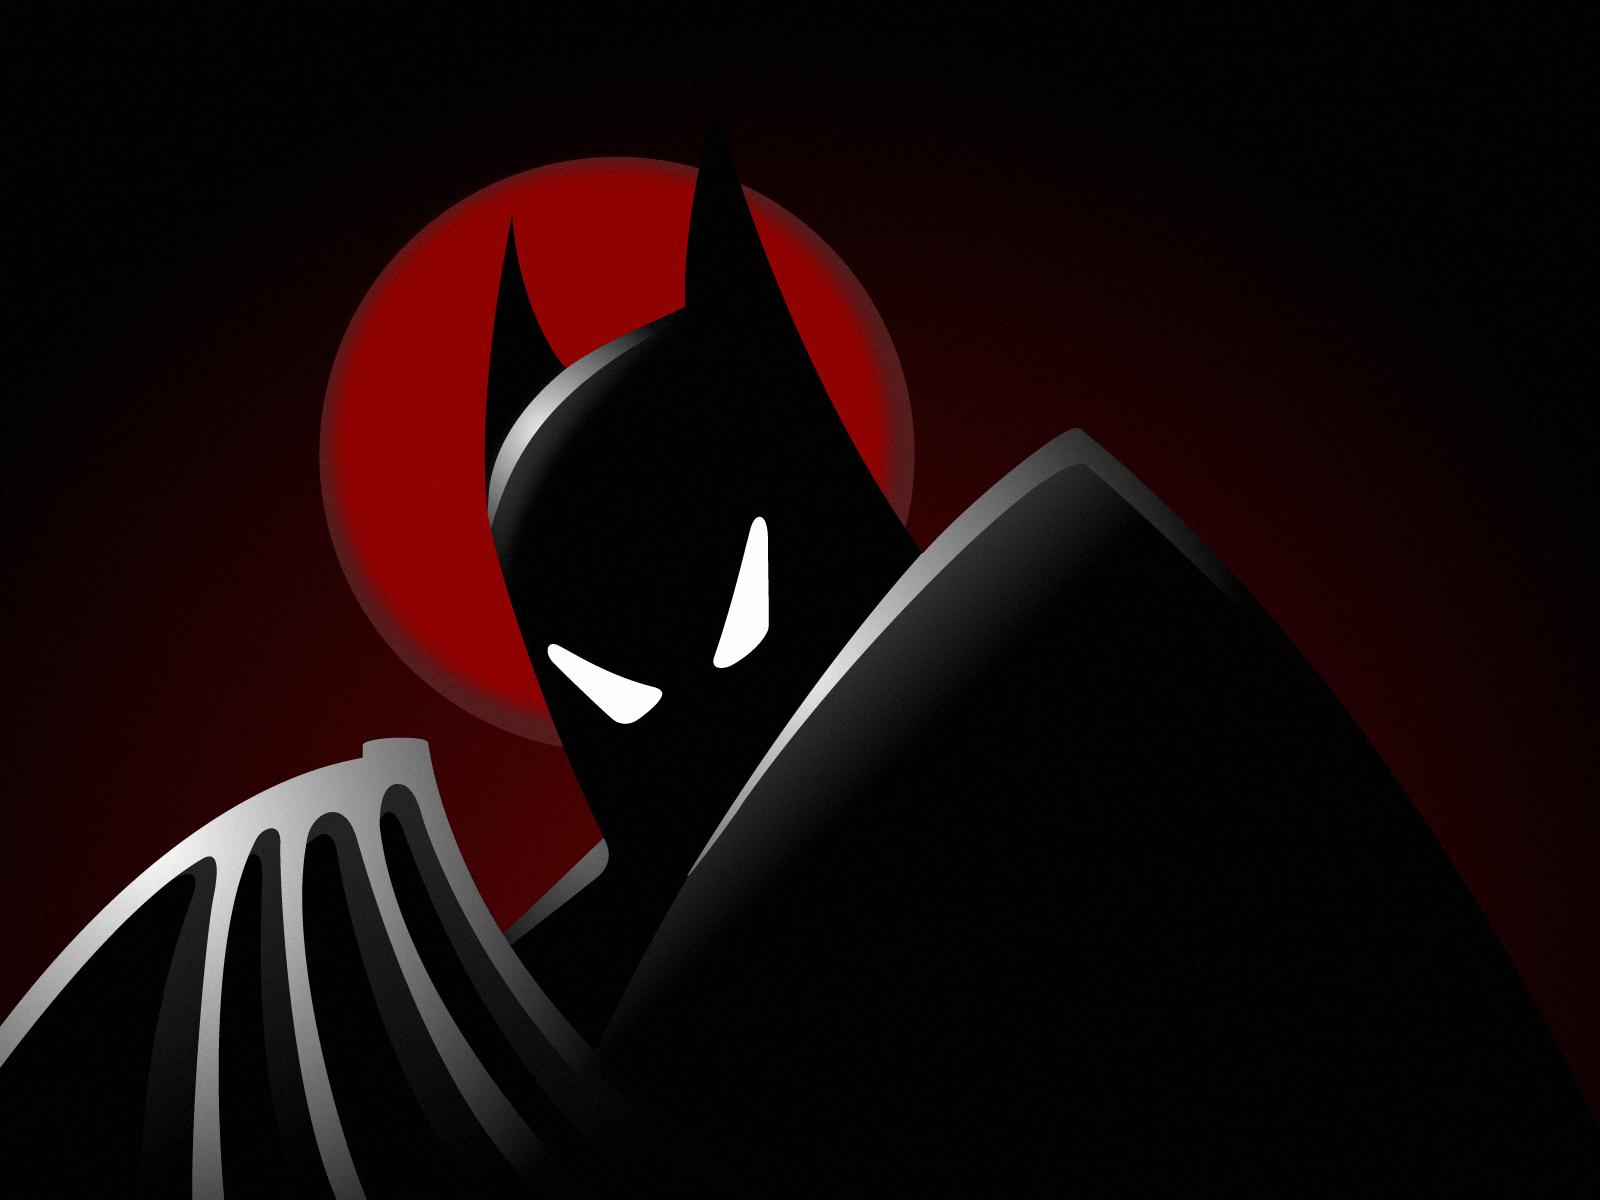 fond d'ecran anime batman